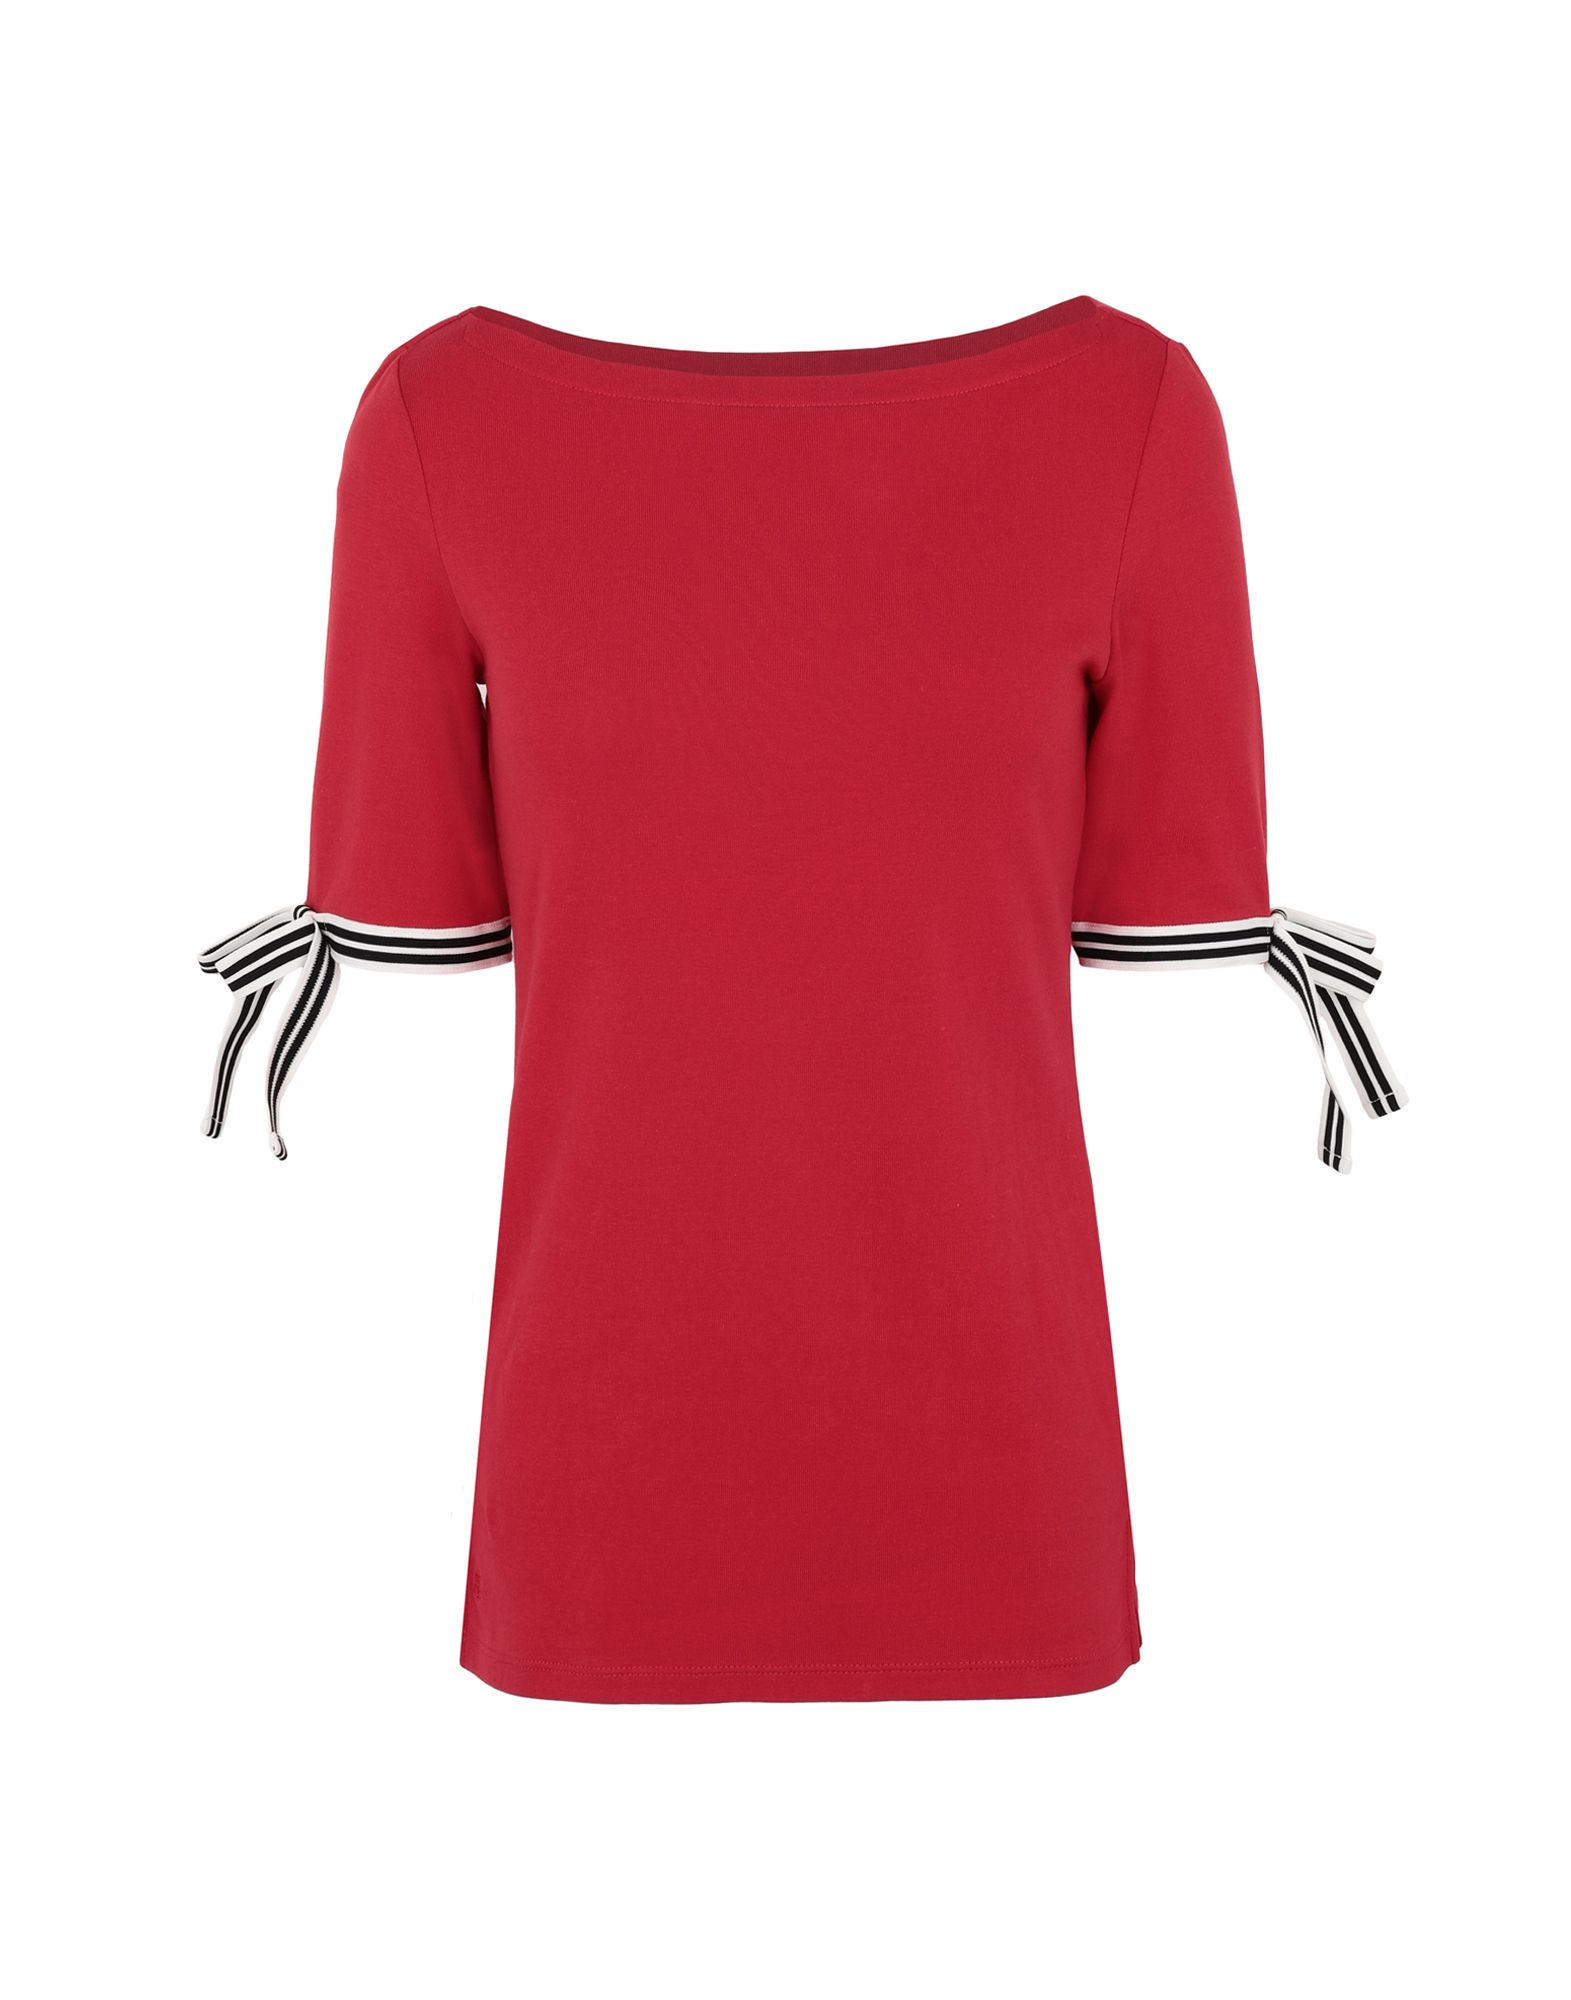 T-Shirt Lauren Ralph Lauren Laced Sleeve Sleeve Cotton Tee - donna - 12311295PR